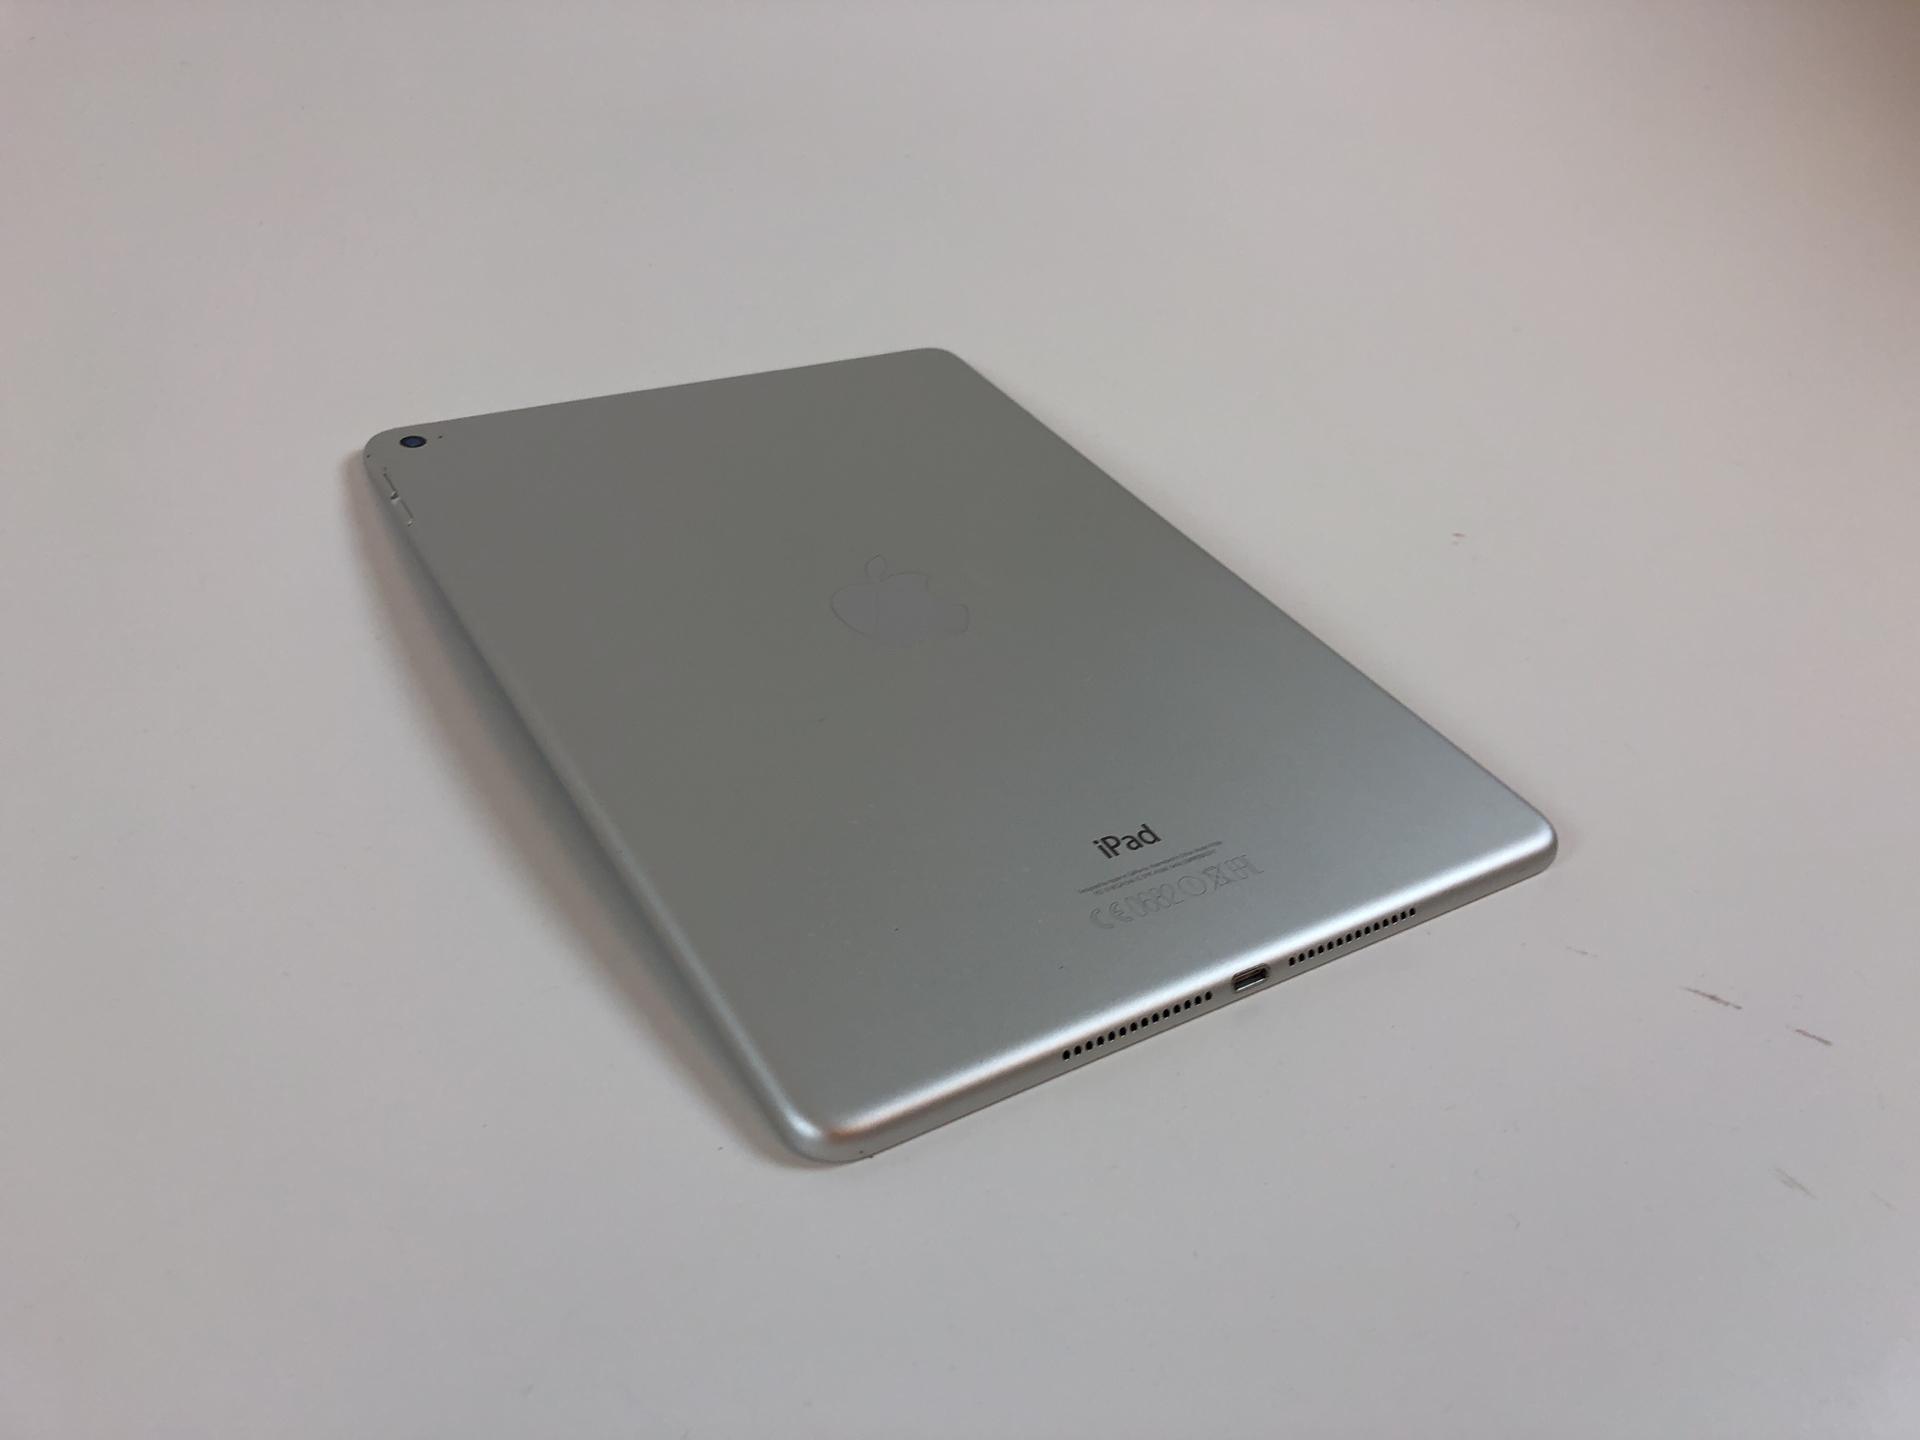 iPad Air 2 Wi-Fi 16GB, 16GB, Silver, imagen 3